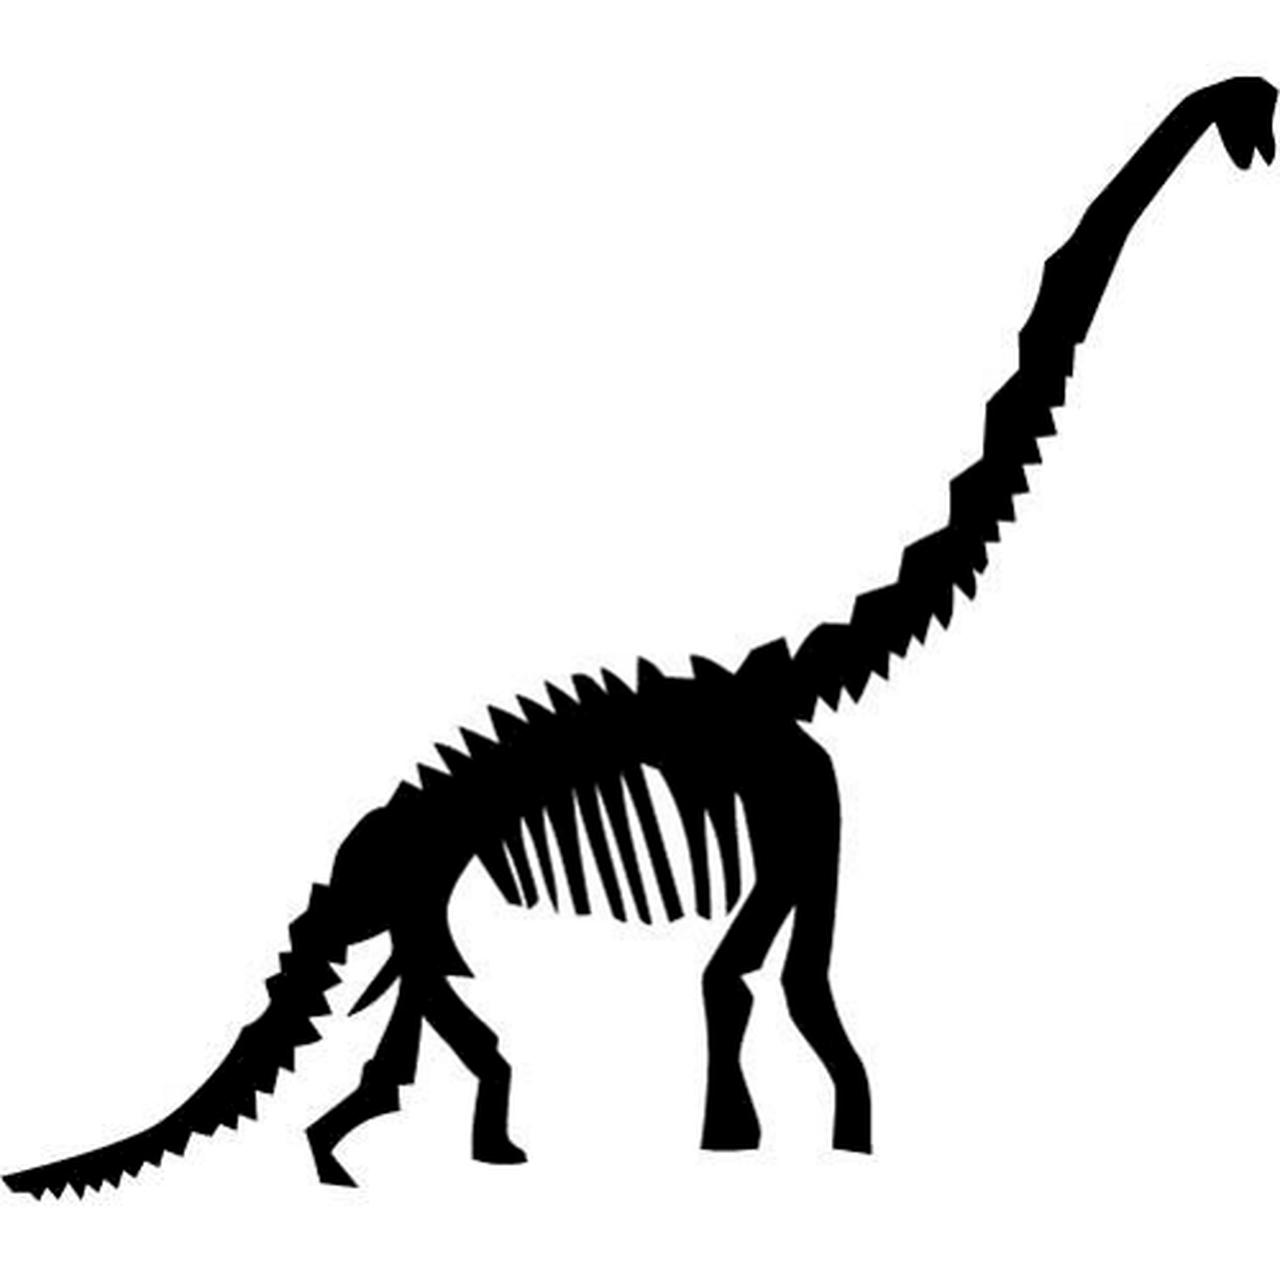 Brachiosaurus skeleton silhouette clipart image freeuse stock Brachiosaurus Dinosaur Fossil Decal image freeuse stock